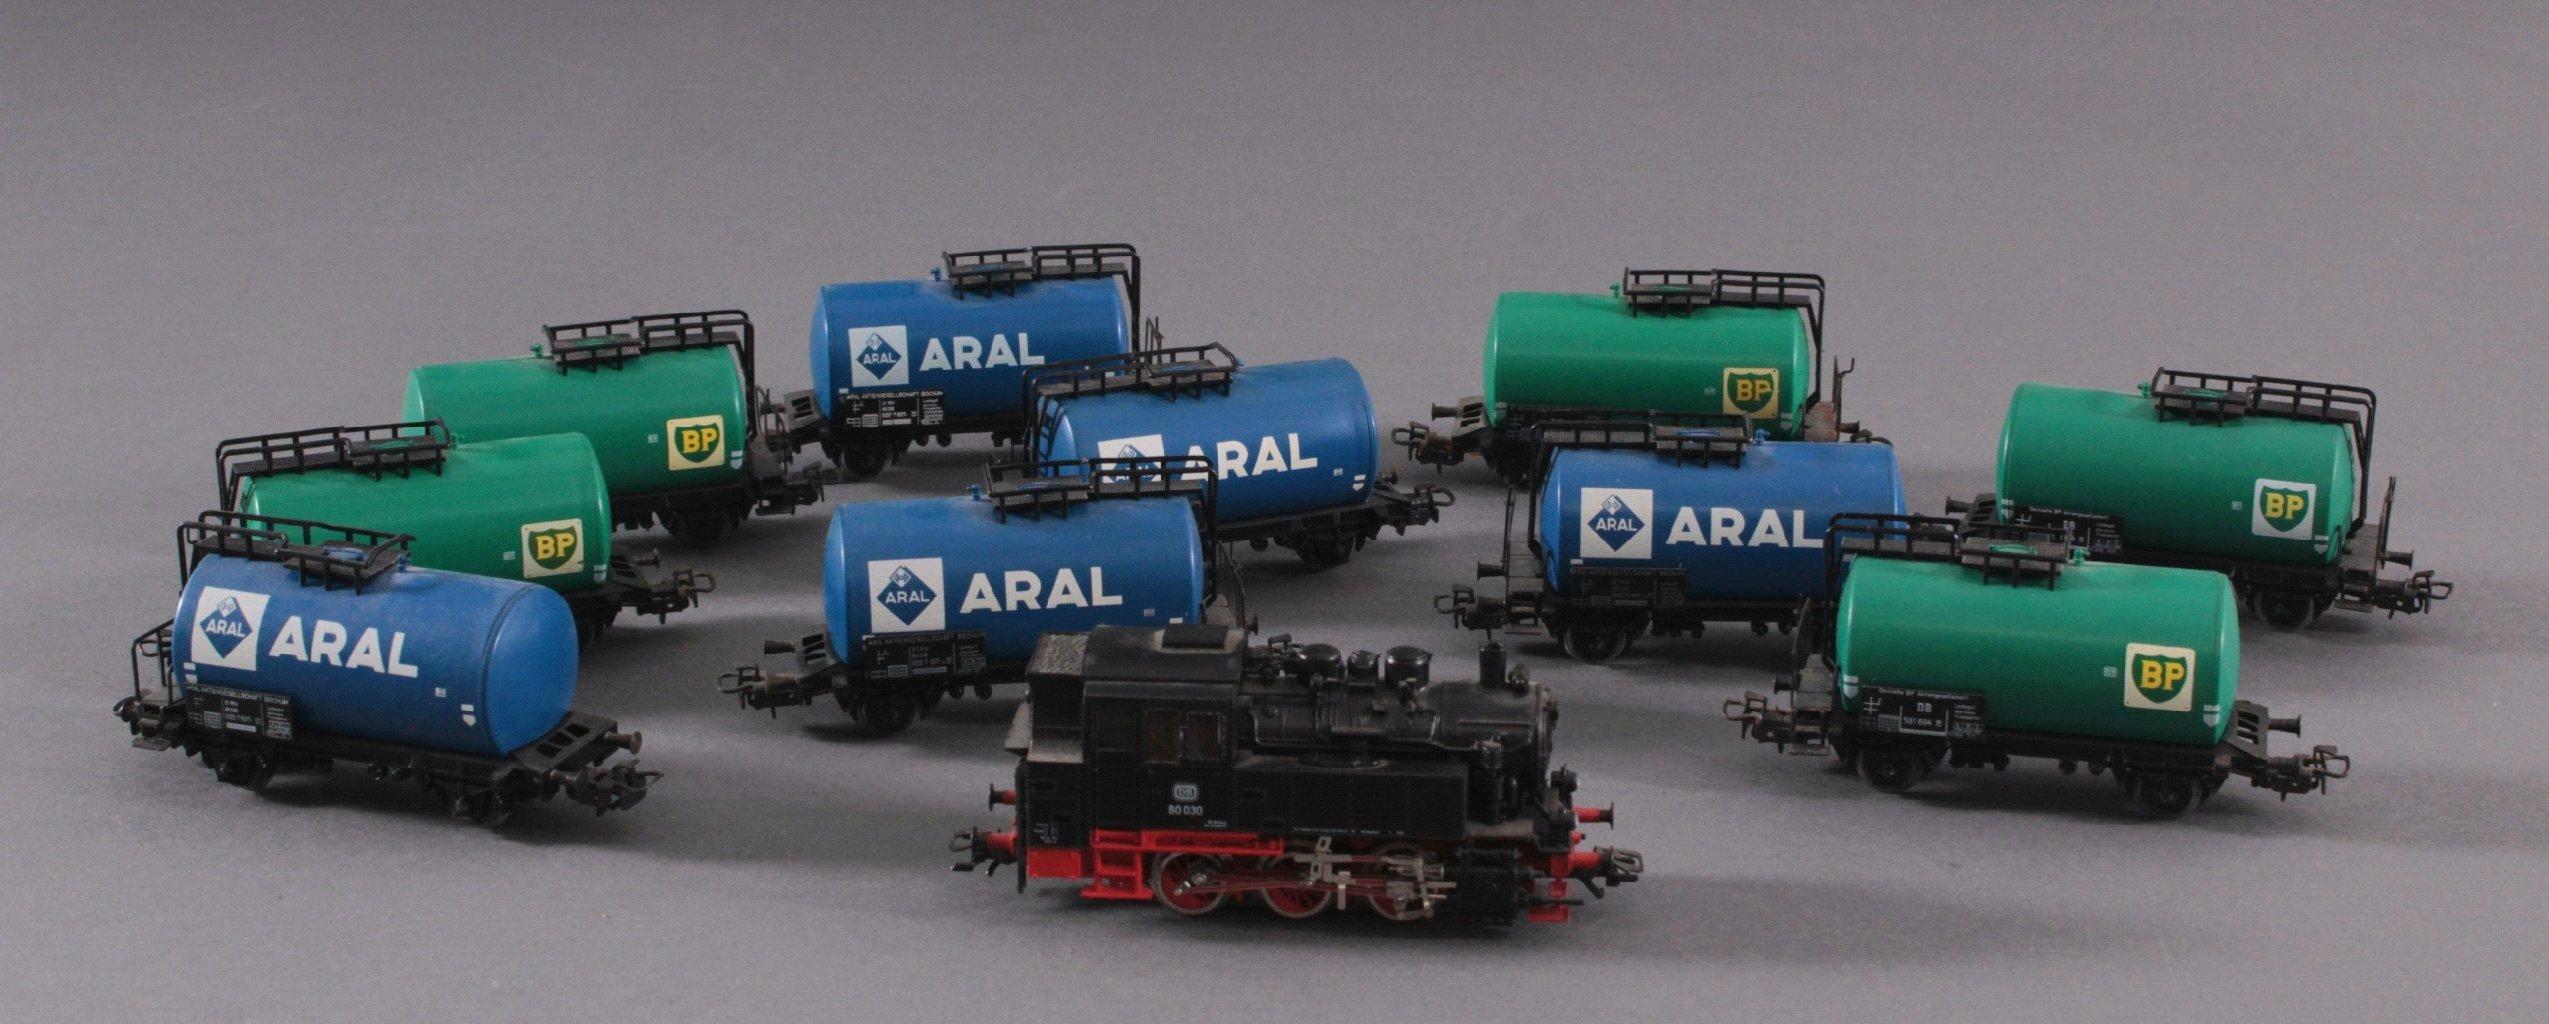 Märklin H0 3540 Dampf-Lok BR 80030 DB in schwarz mit